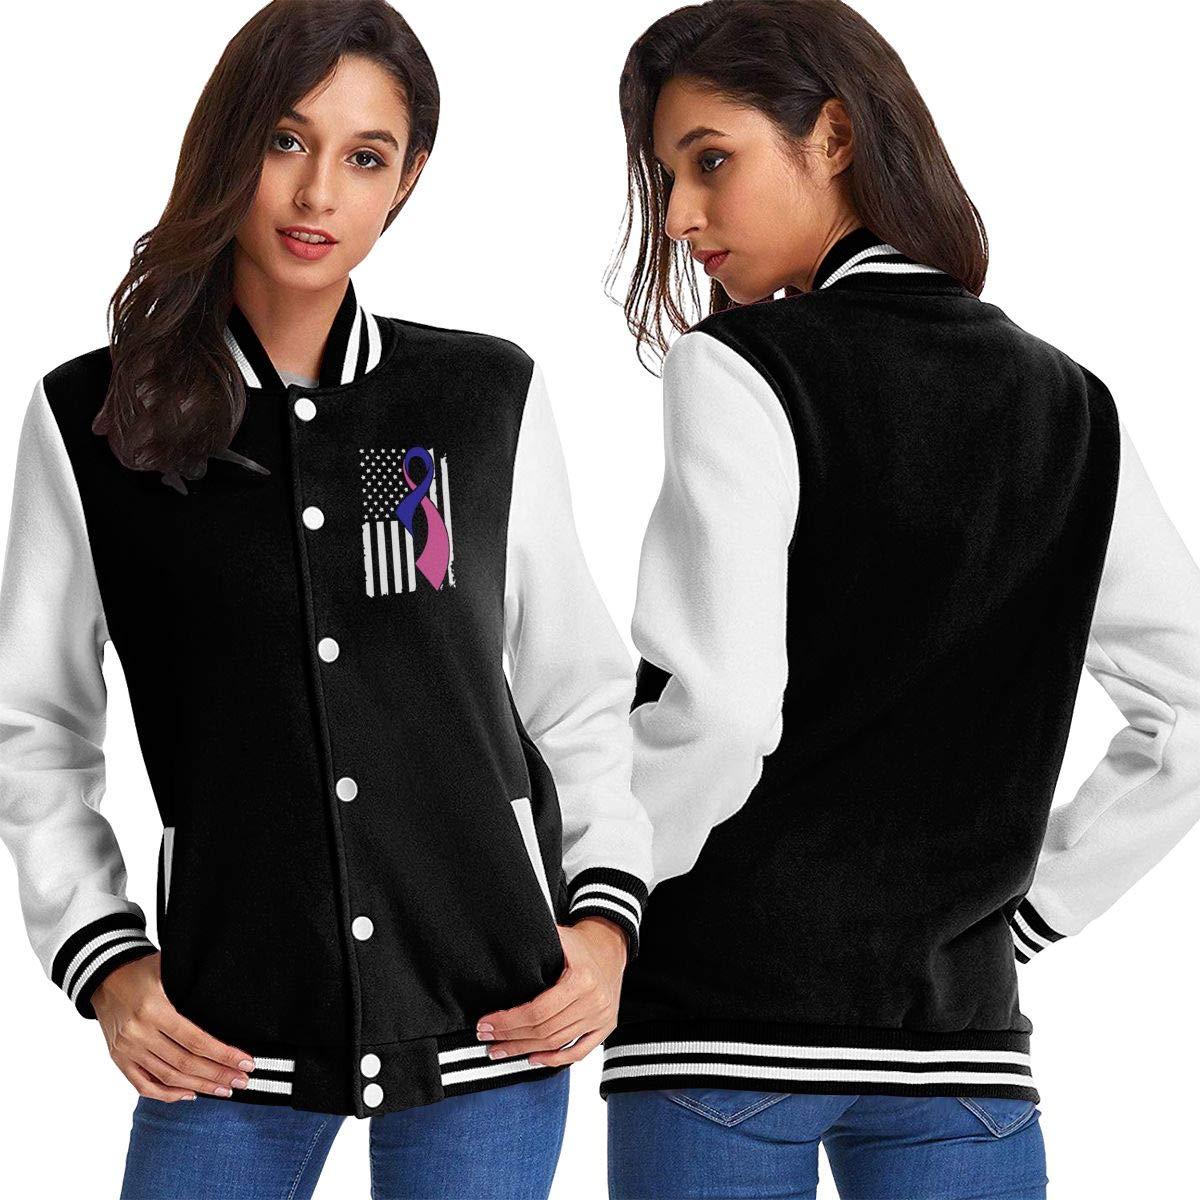 Thyroid Cancer Awareness Flag Womens Casual Baseball Varsity Jacket Cotton Coat